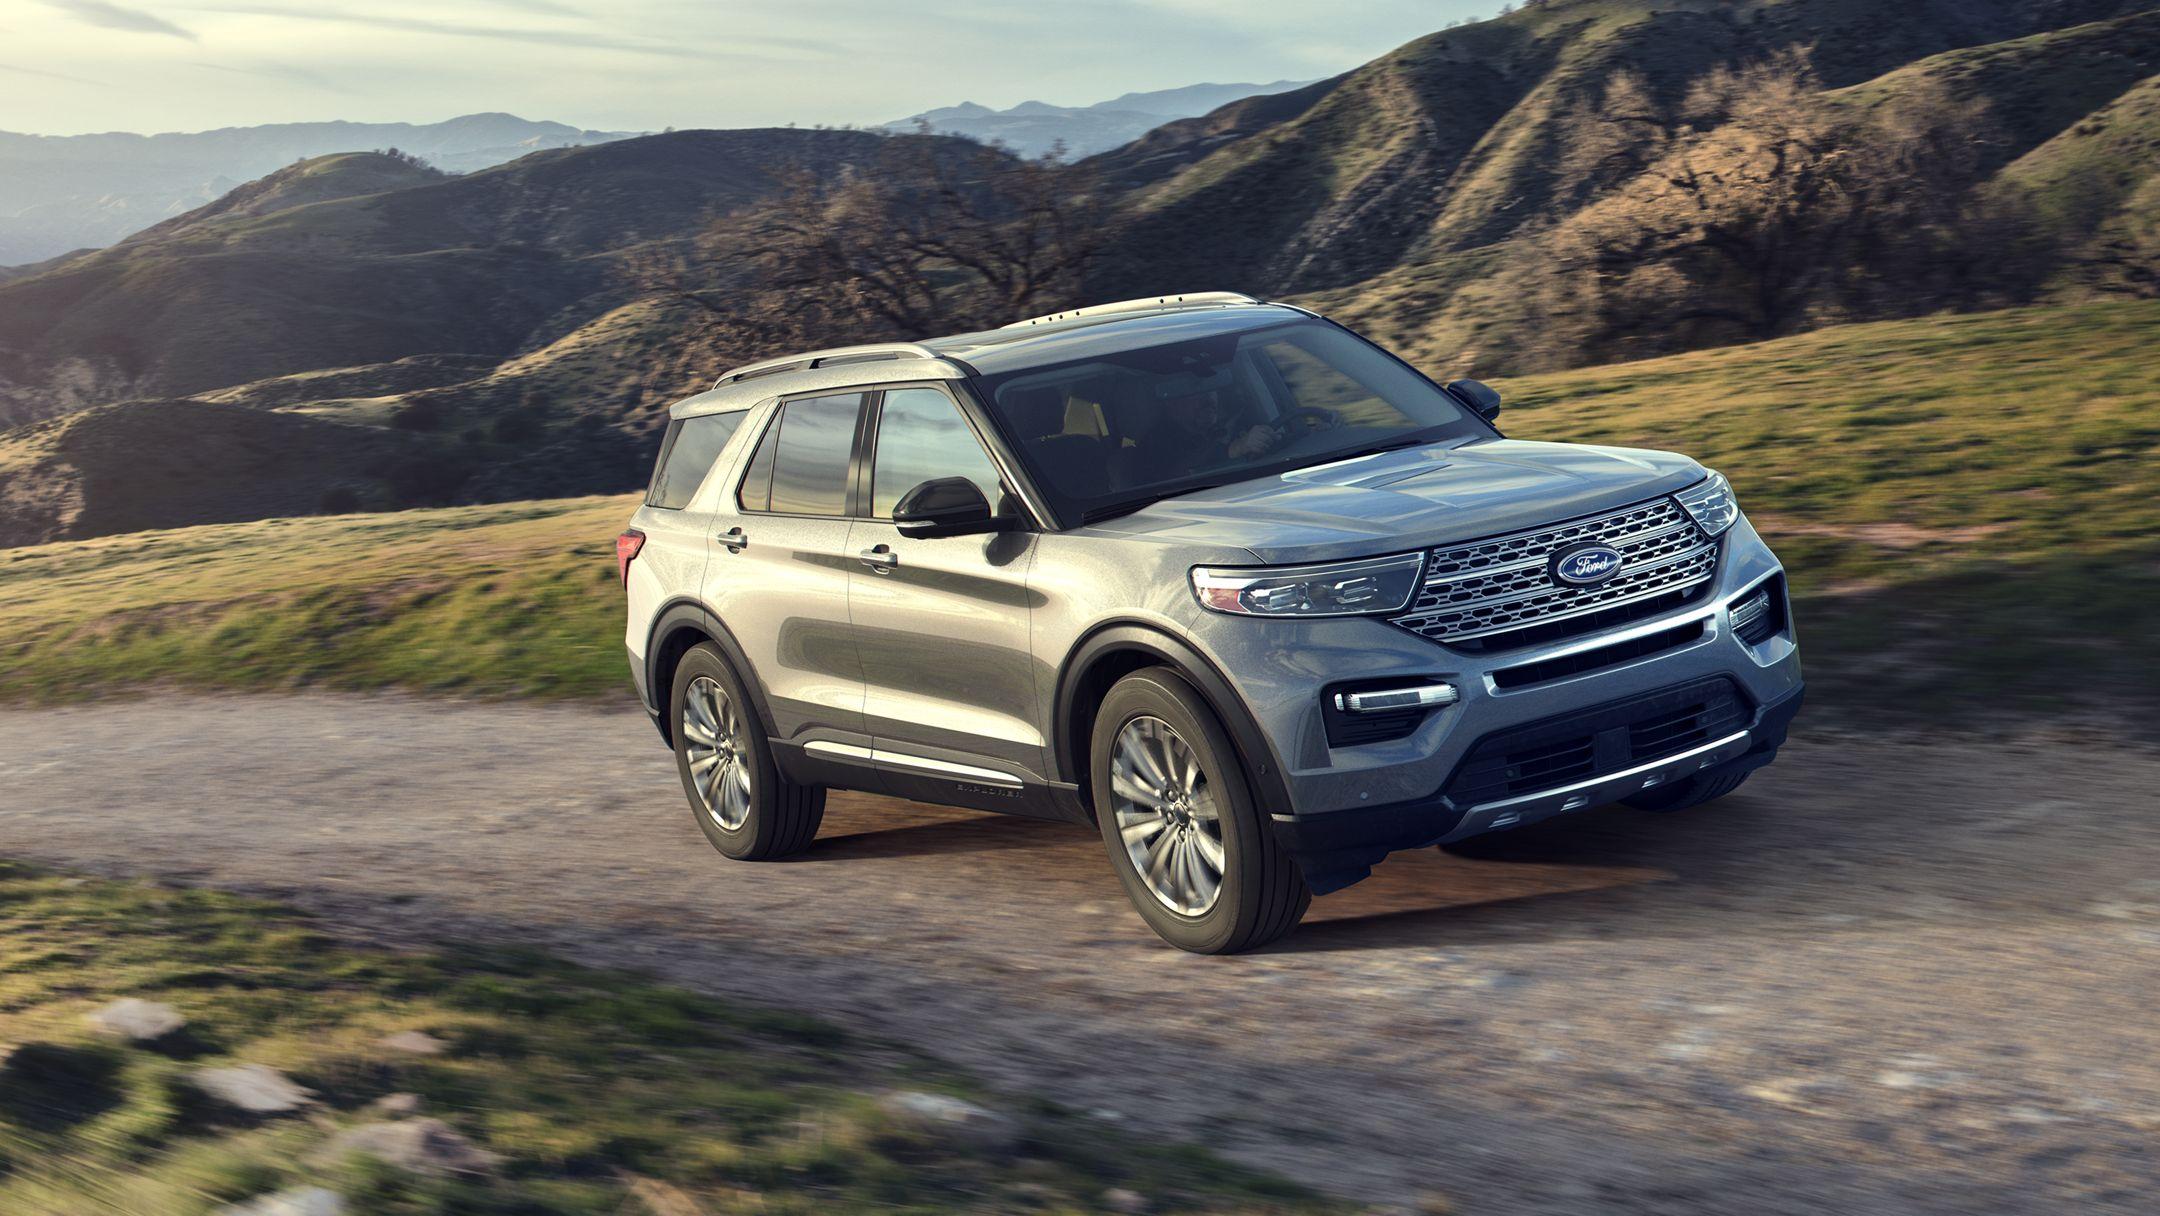 2020 Ford Explorer Intelligent 4WD